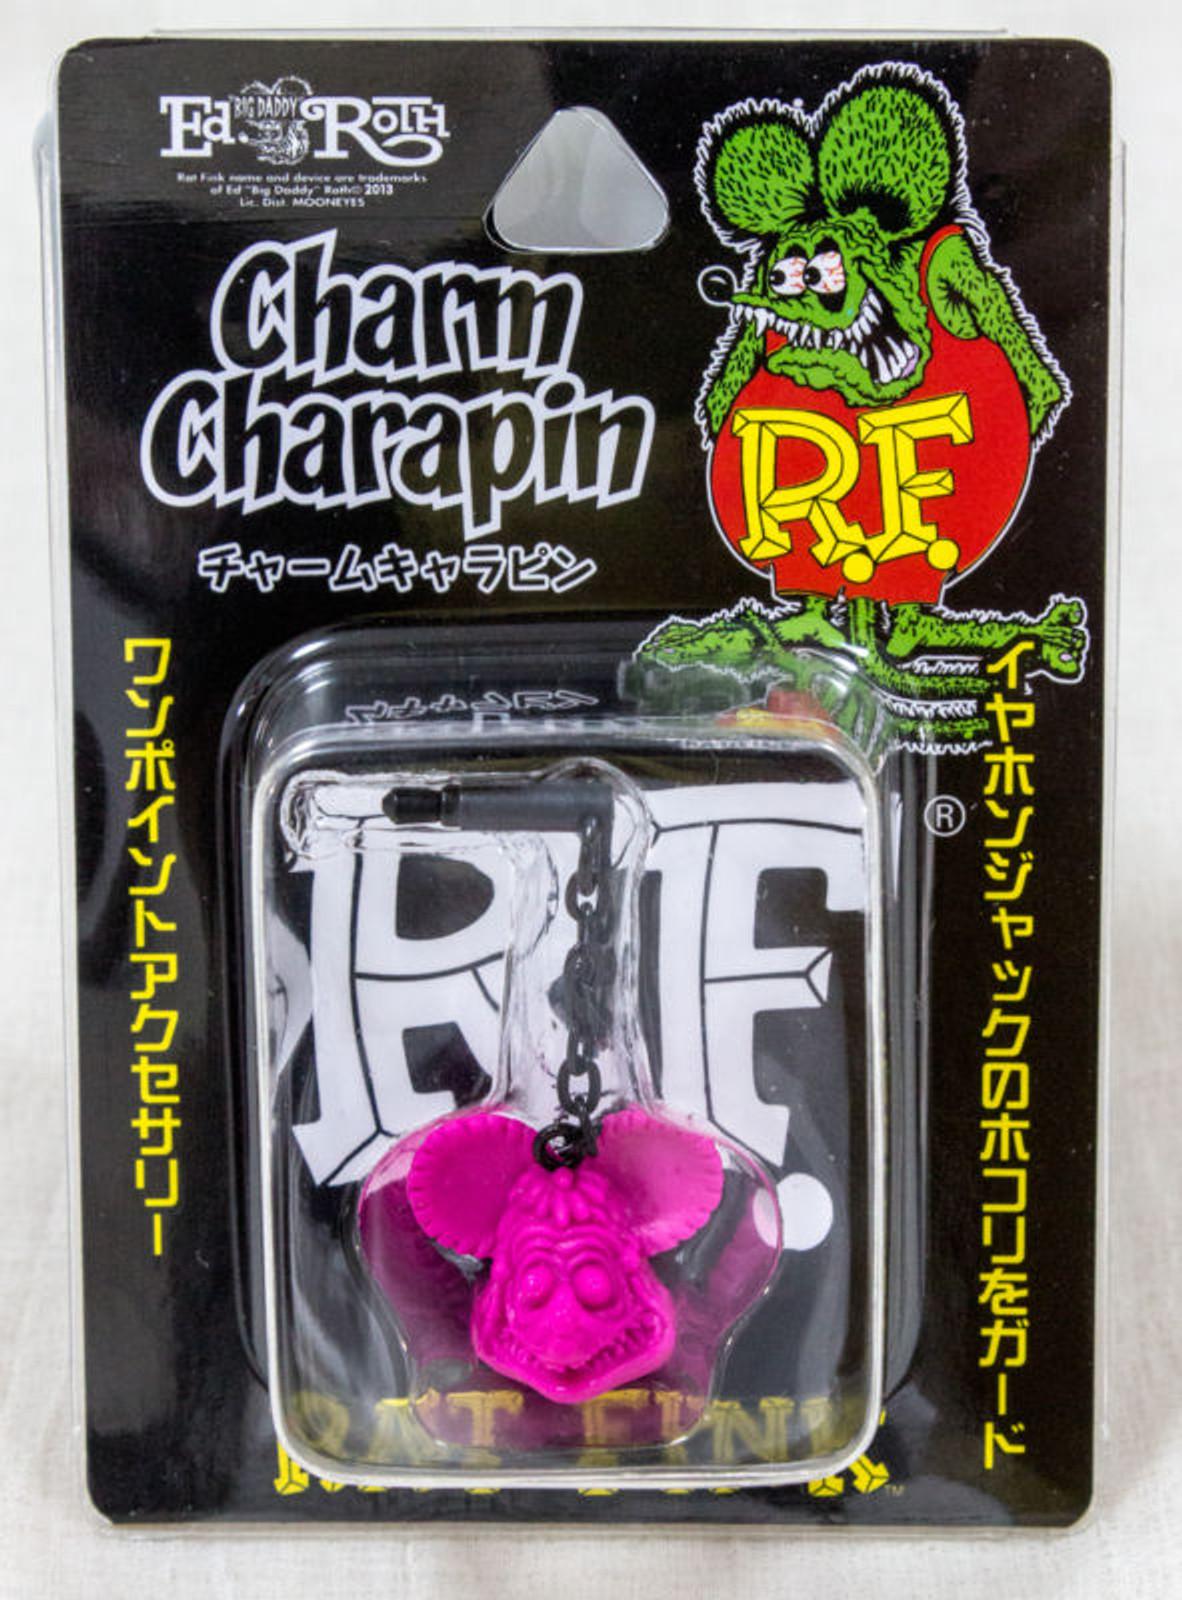 RAT FINK Pink Ver. Charm Charapin for Smart Phones for Earphone Jack